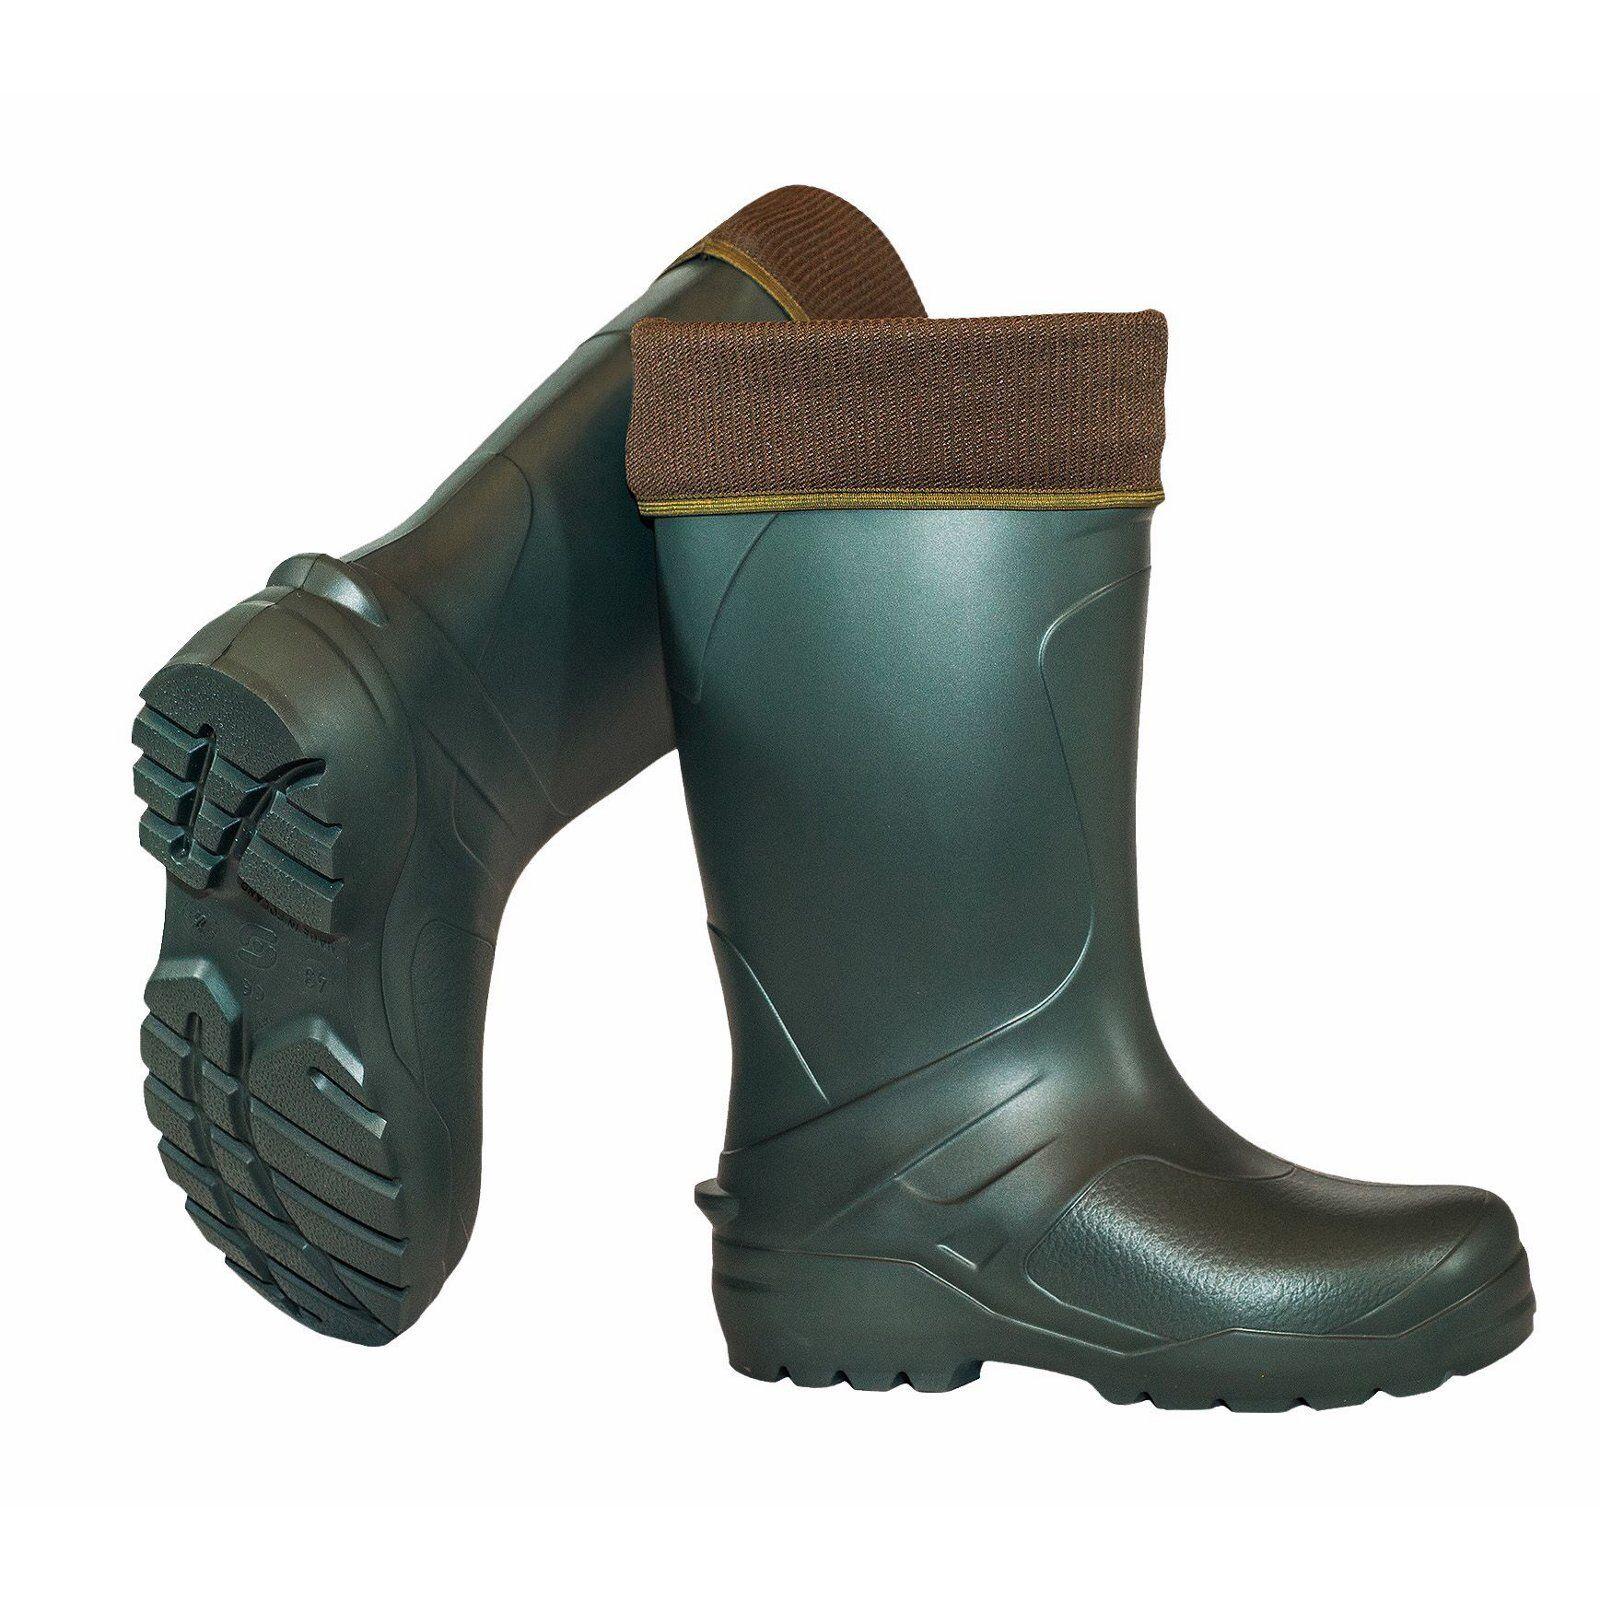 Crosslander gomma Uomo Stivali Vancouver-VERDE - 43 Stivali di gomma Crosslander inverno stivali da uomo b9865c